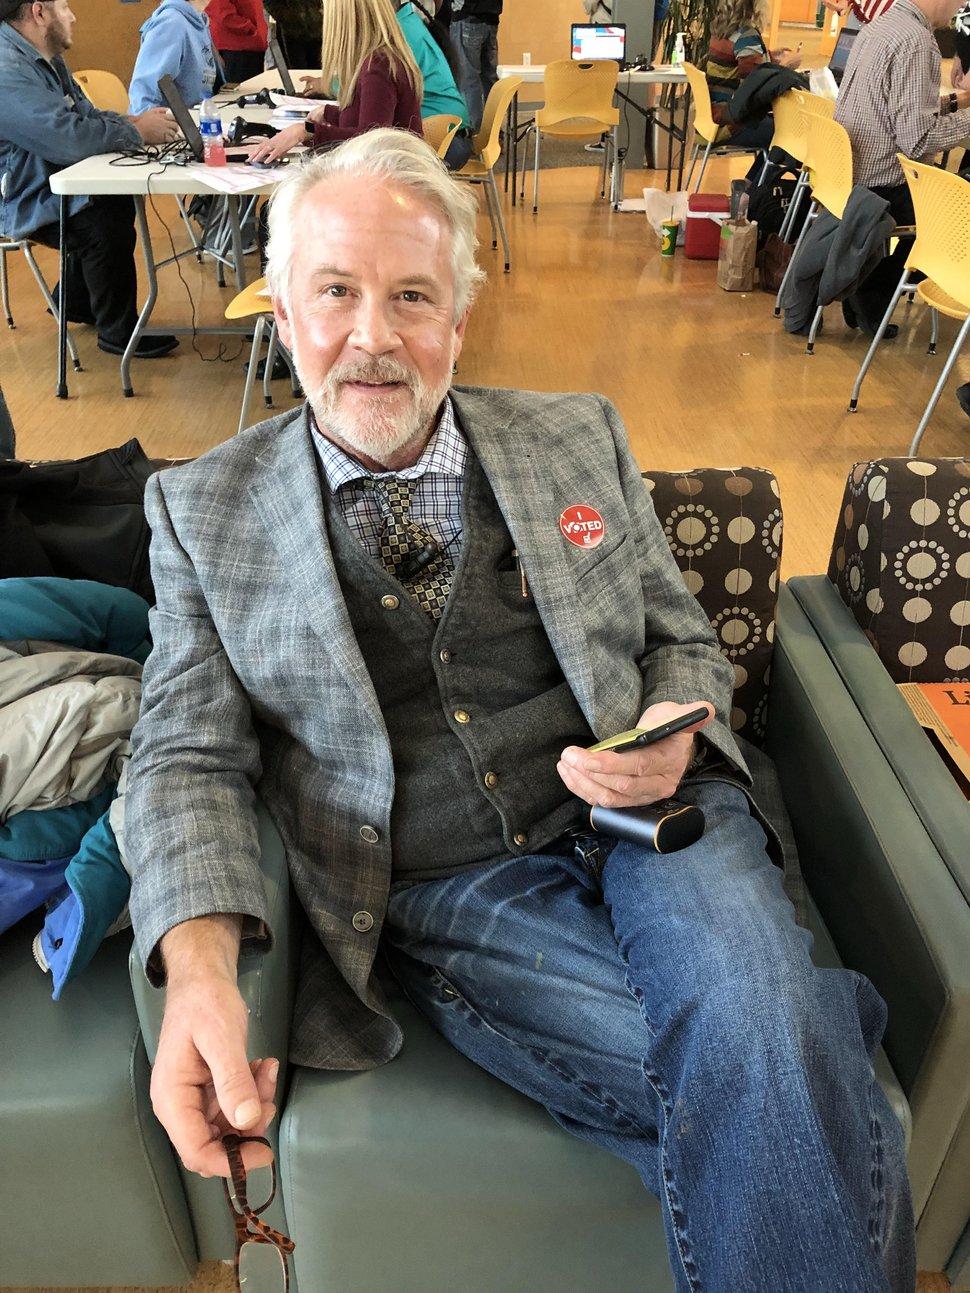 (Taylor Stevens | The Salt Lake Tribune) Tom Beckett, 63, of Salt Lake City, Utah.